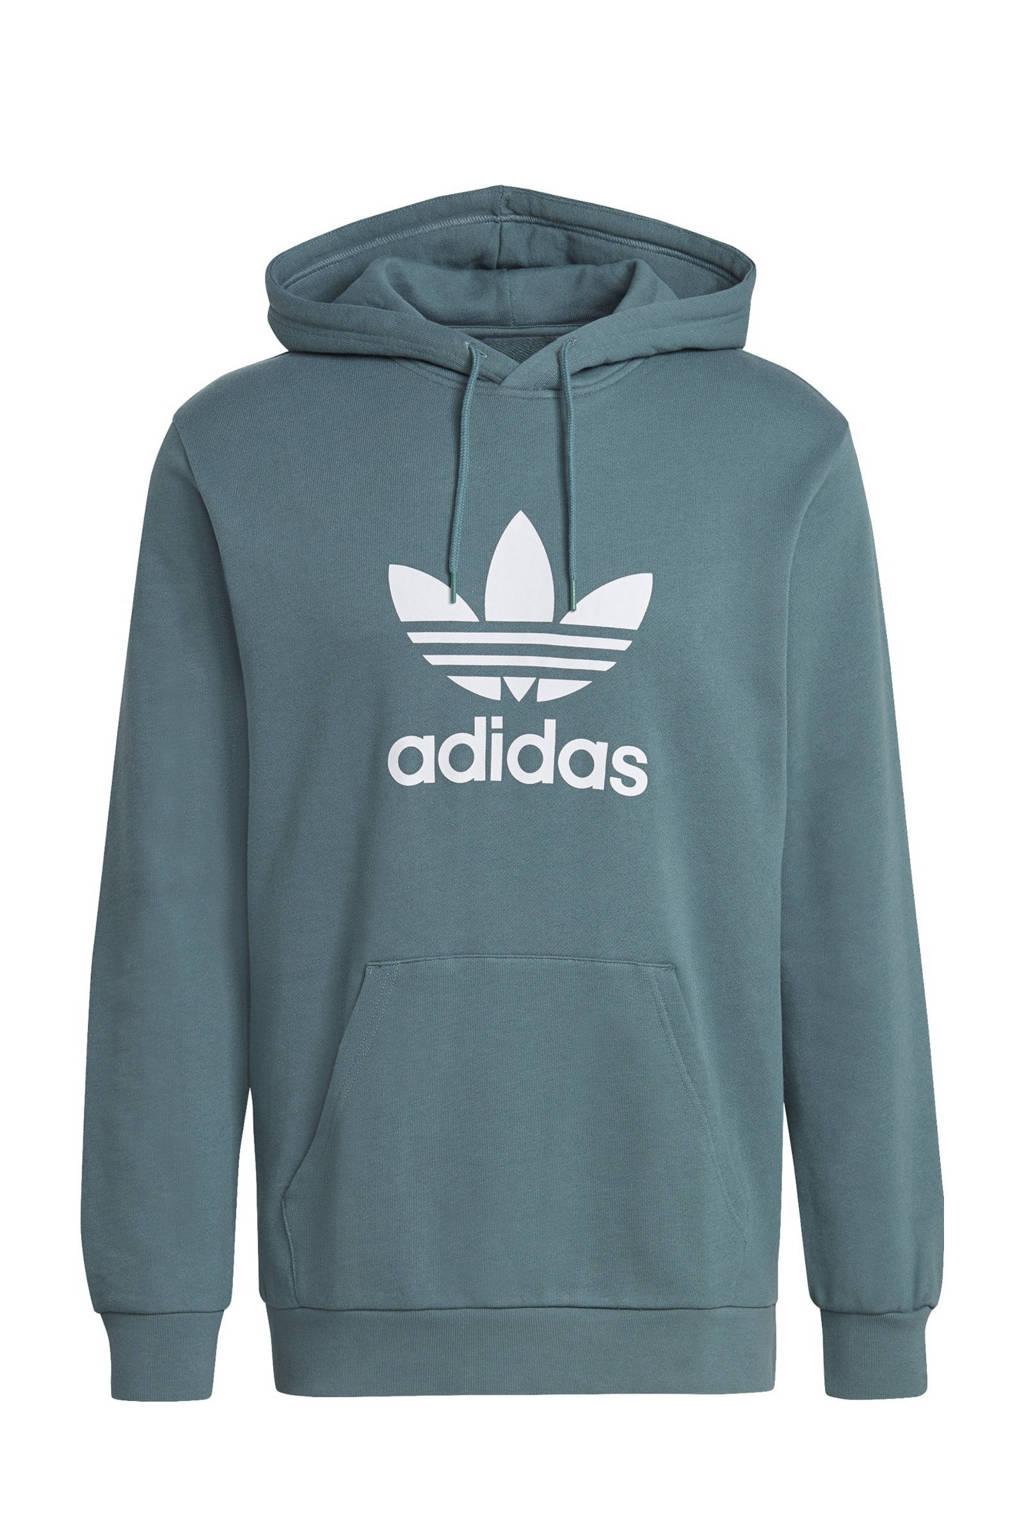 adidas Originals Adicolor hoodie petrol, Petrol